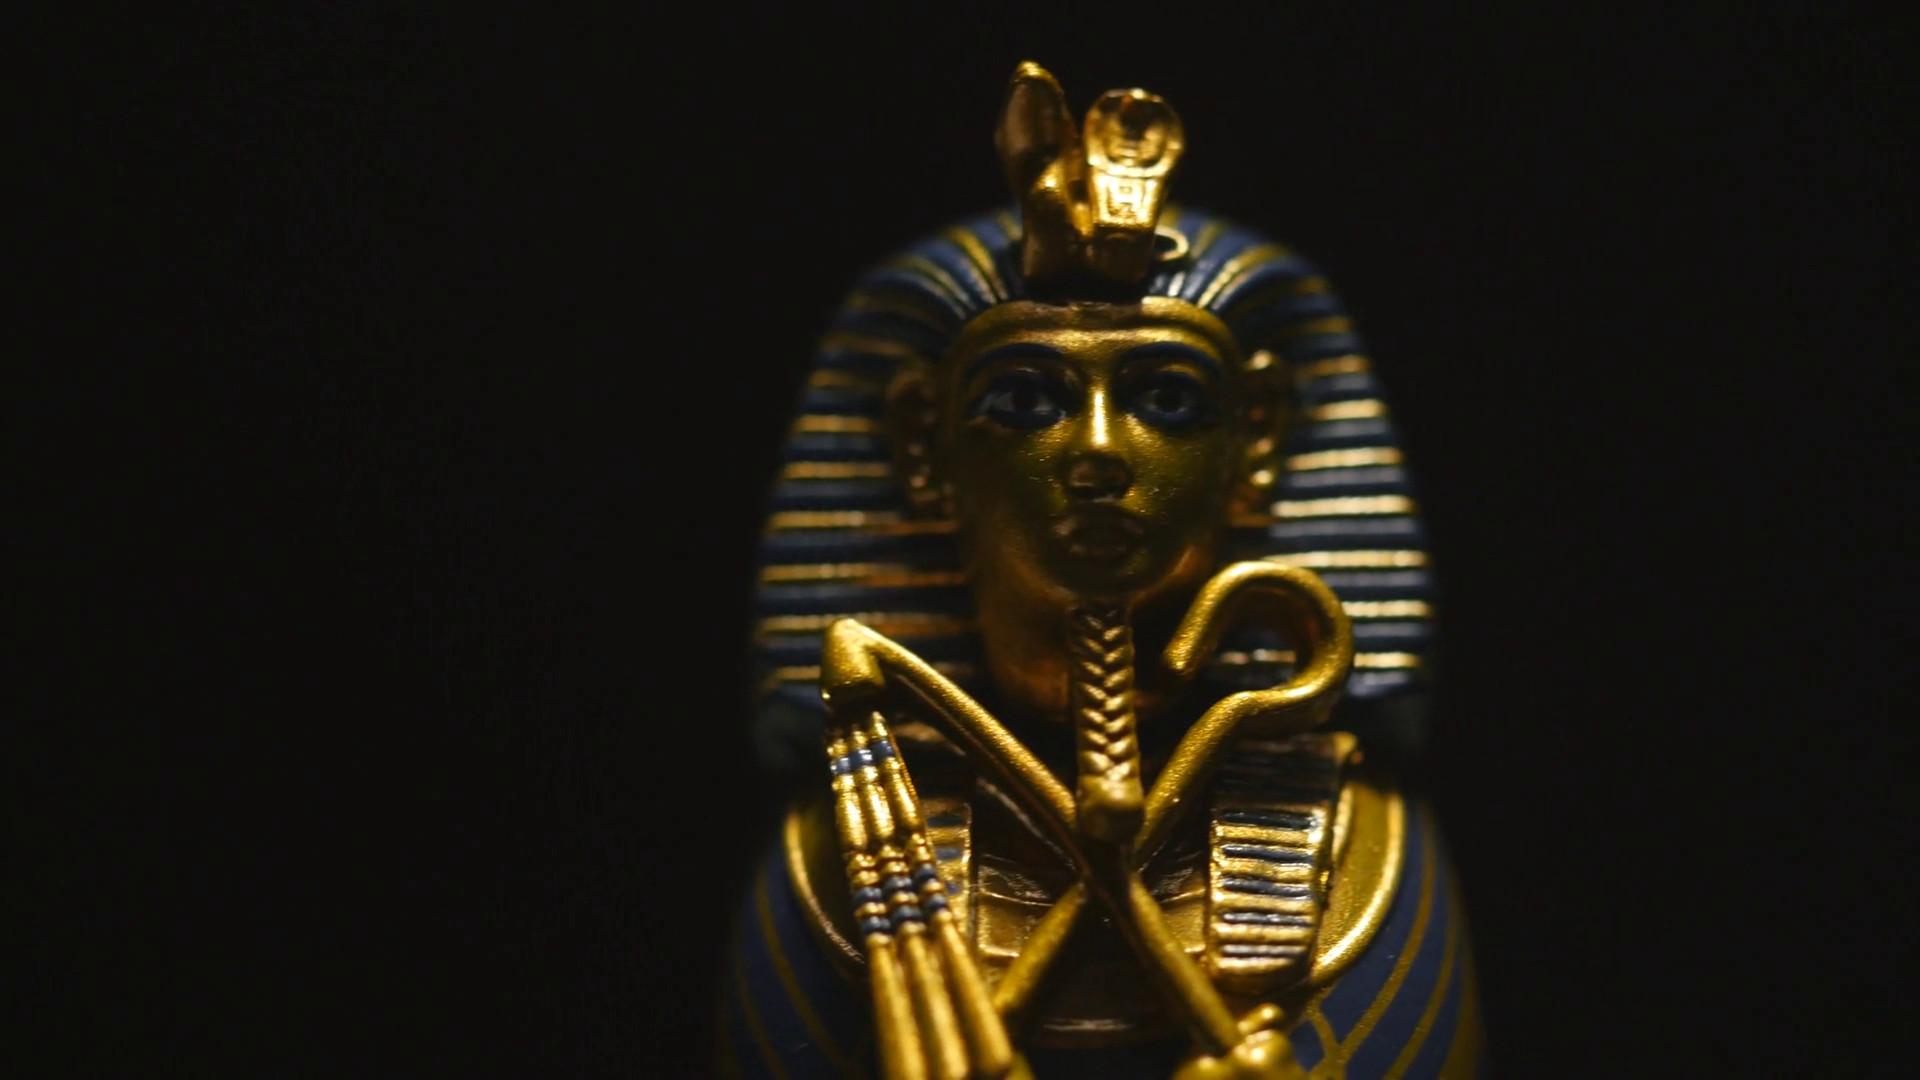 4K Old Sarcophagus of Pharaoh Mummy Tomb Artifact – Egypt Figure Stock  Video Footage – VideoBlocks